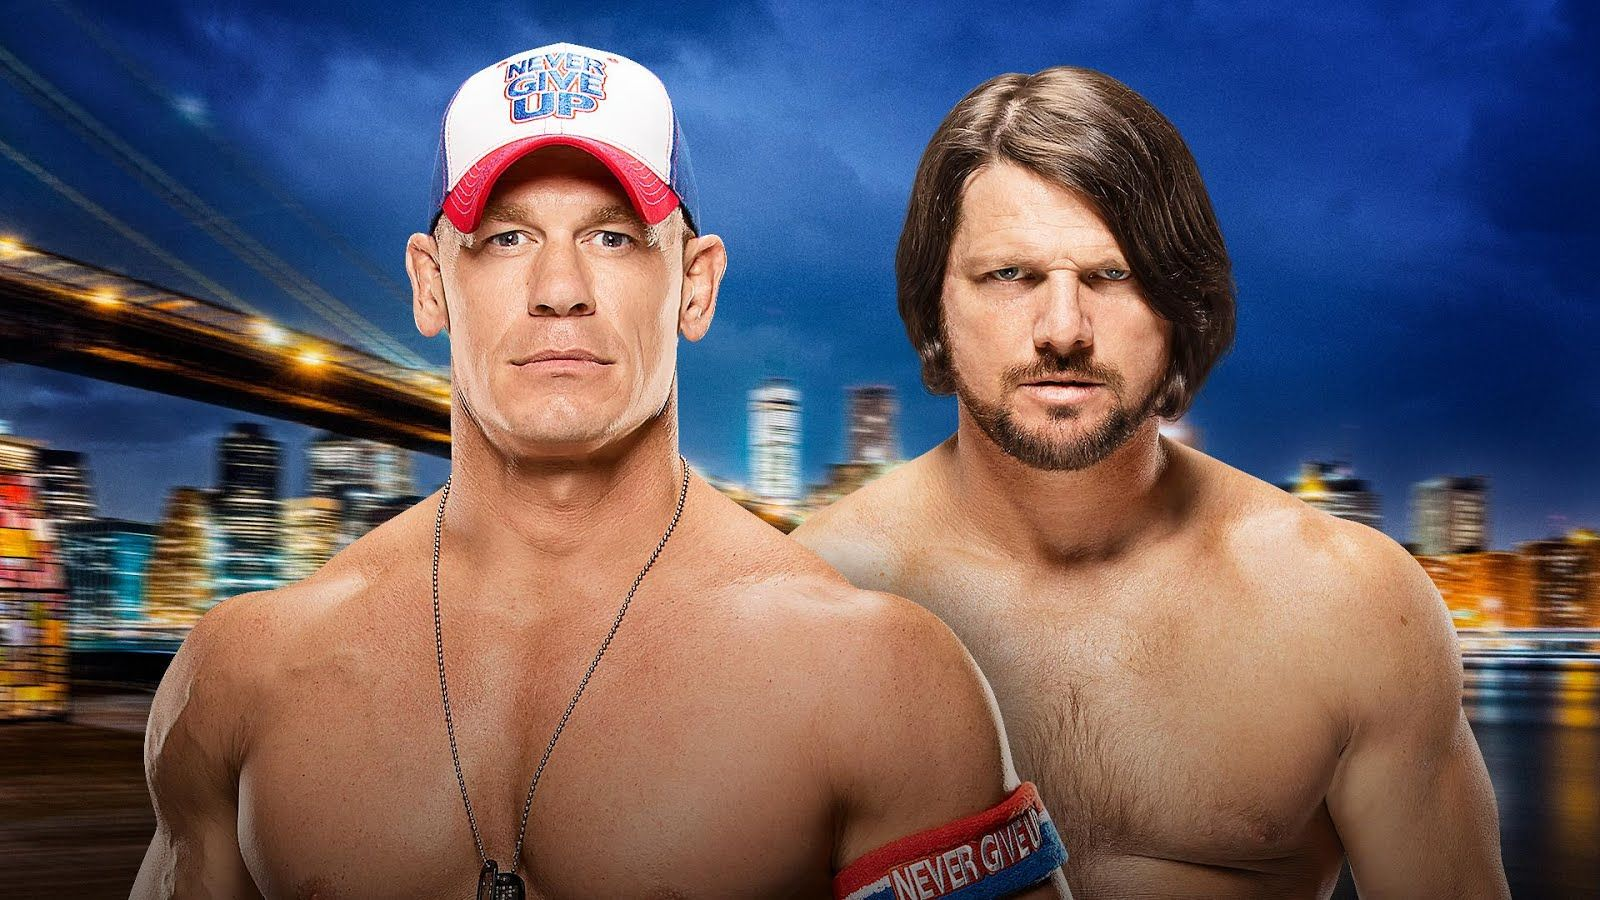 John Cena vs AJ Styles Sunday Summerslam Odds http